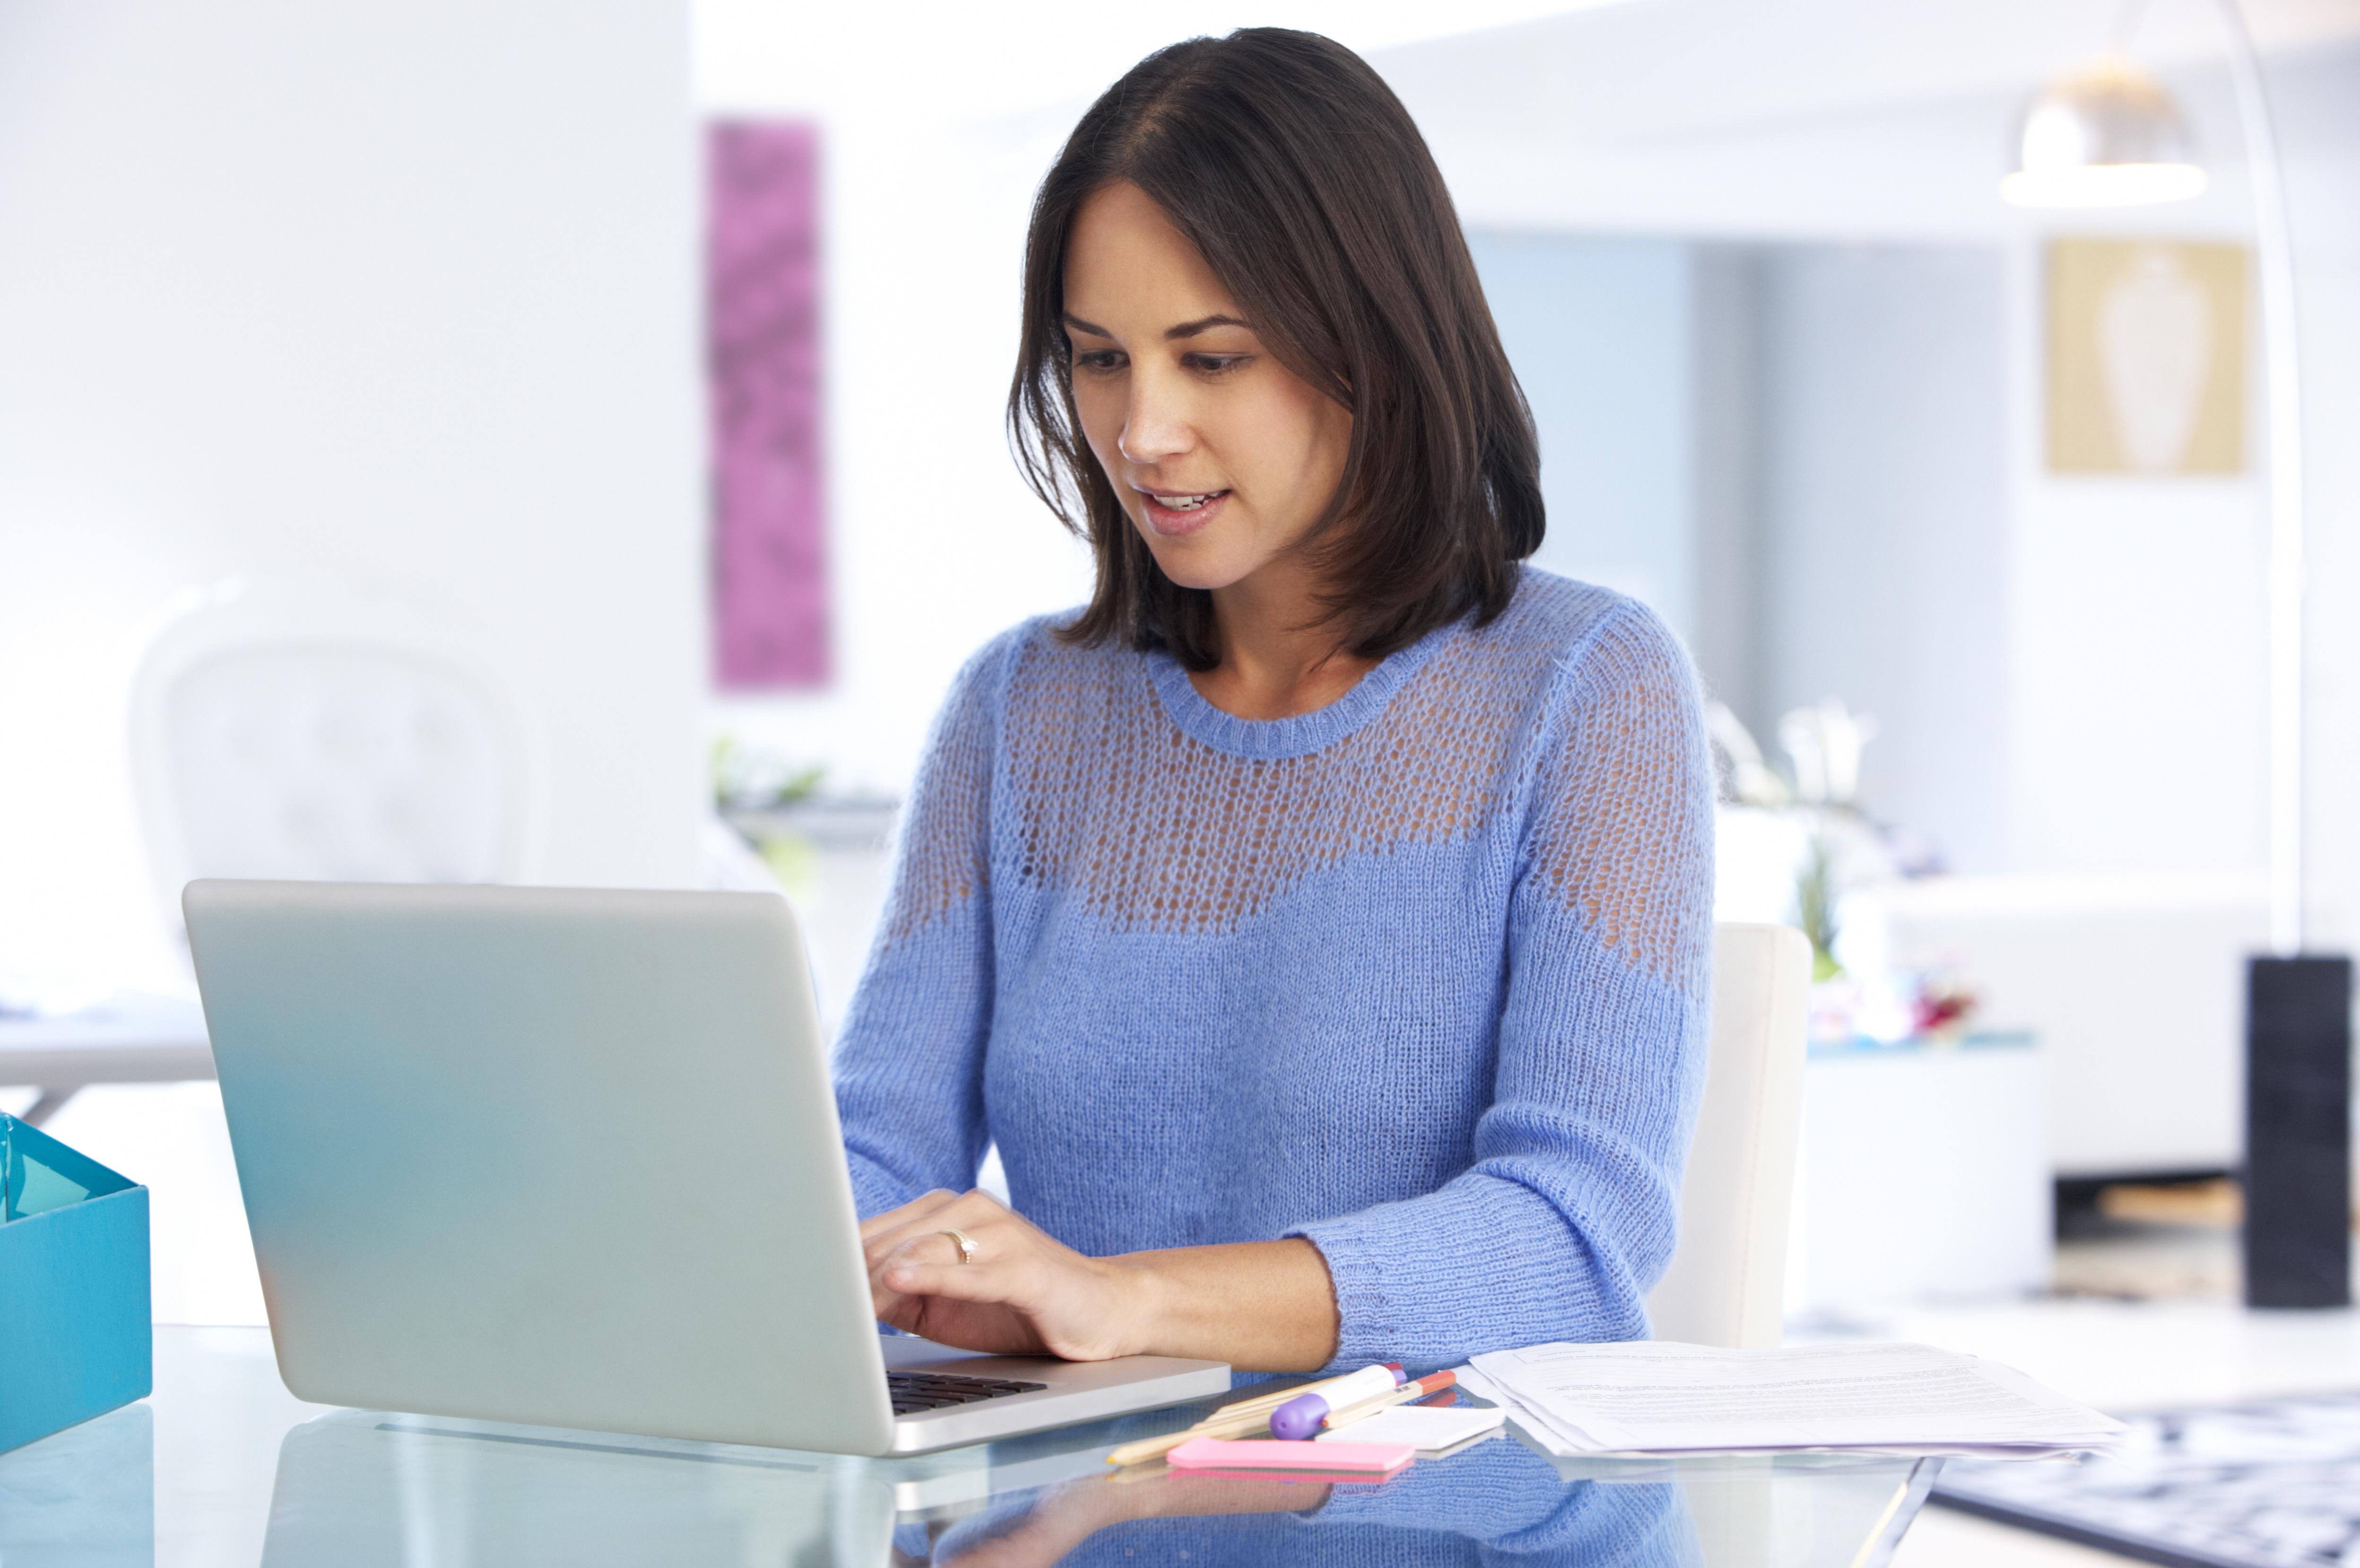 worksheet Home Office Tax Deduction Worksheet home office tax deduction worksheet edeprem com deductions 2015 moreover business organizer